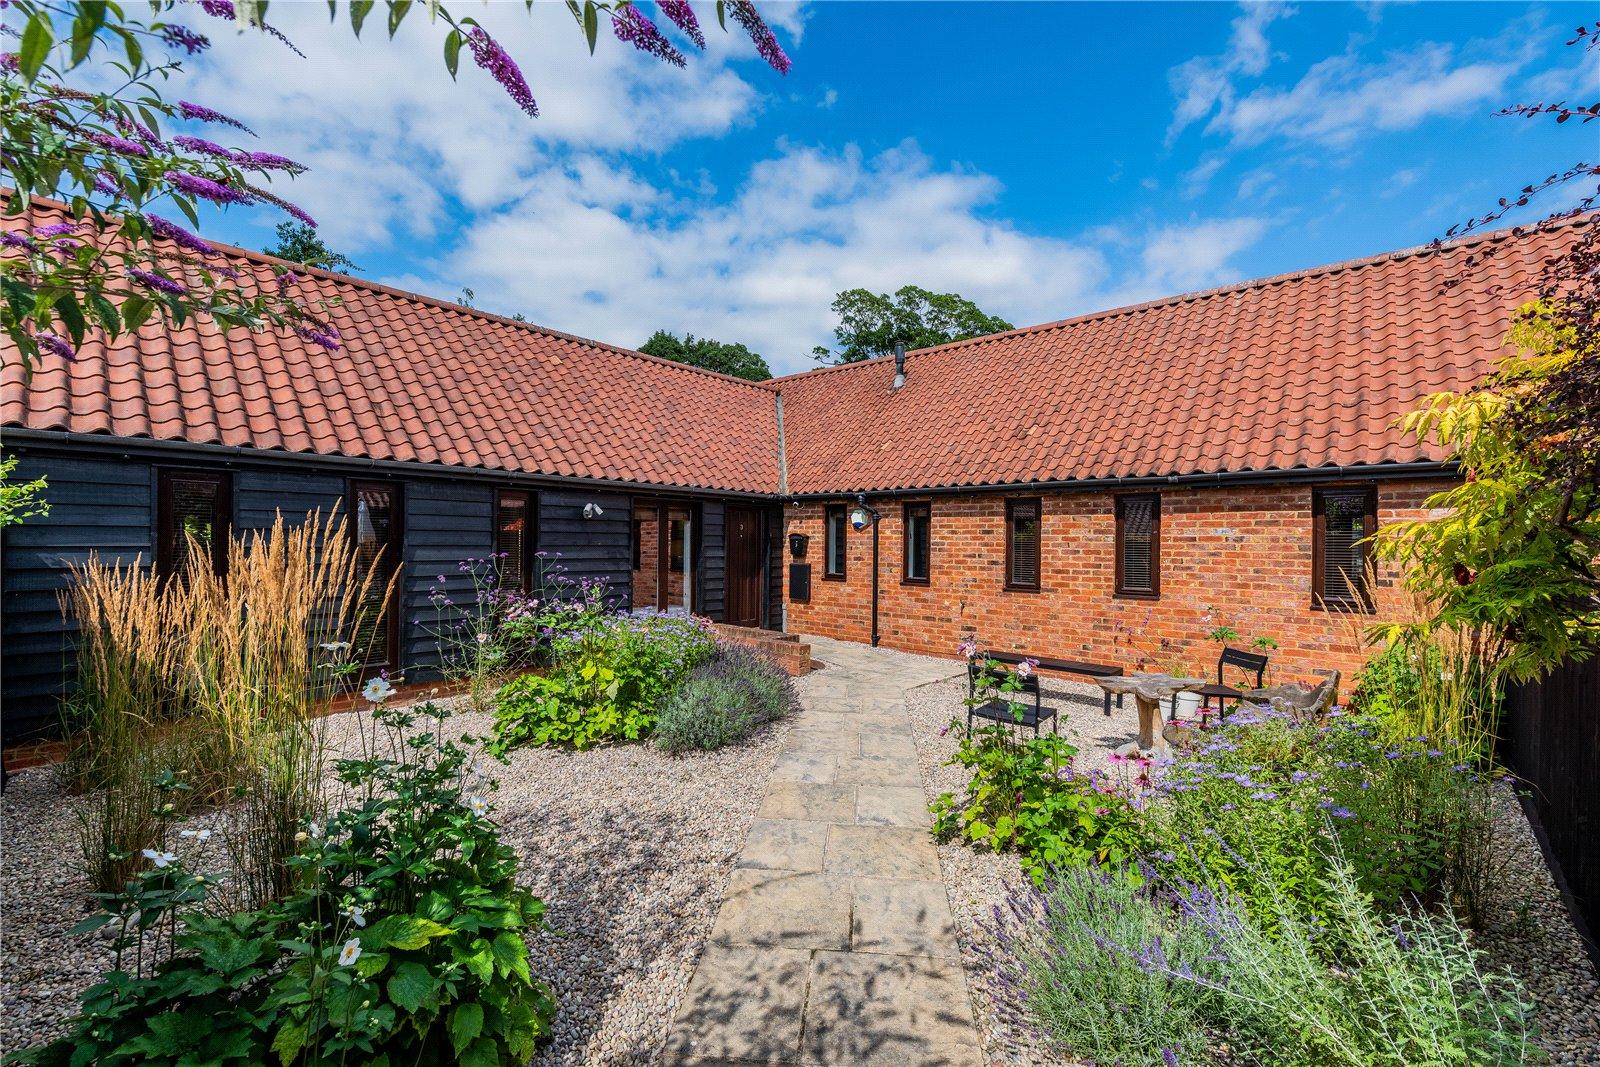 Property for sale near Cambridge